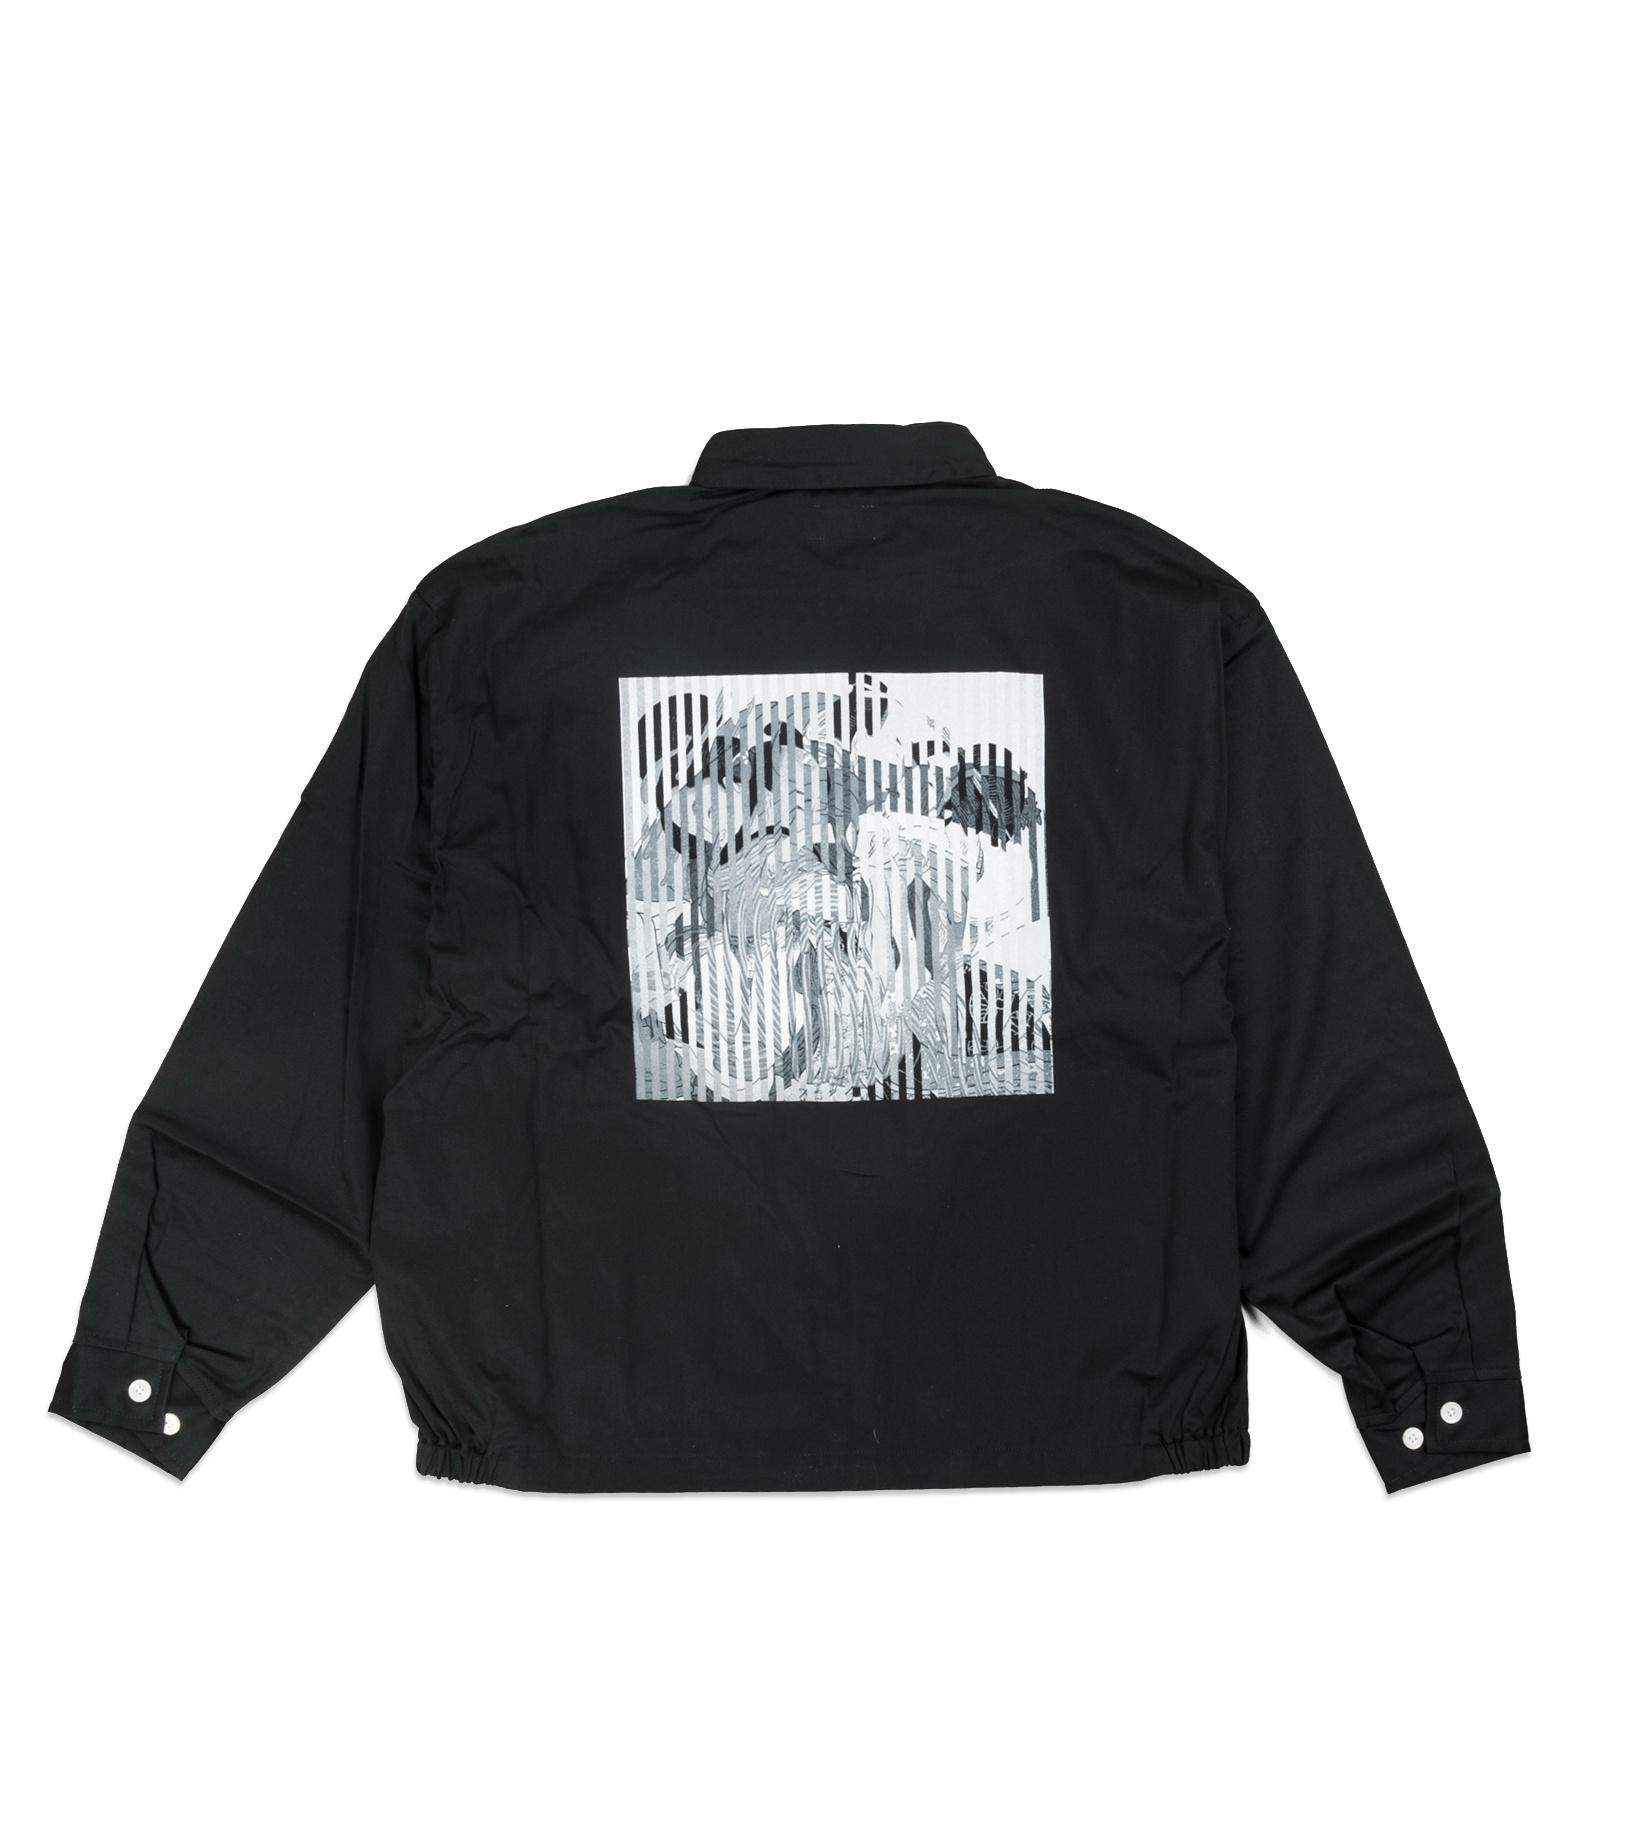 "Goodhood x Kosuke Kawamura Swing Top Jacket ""Black""-4"